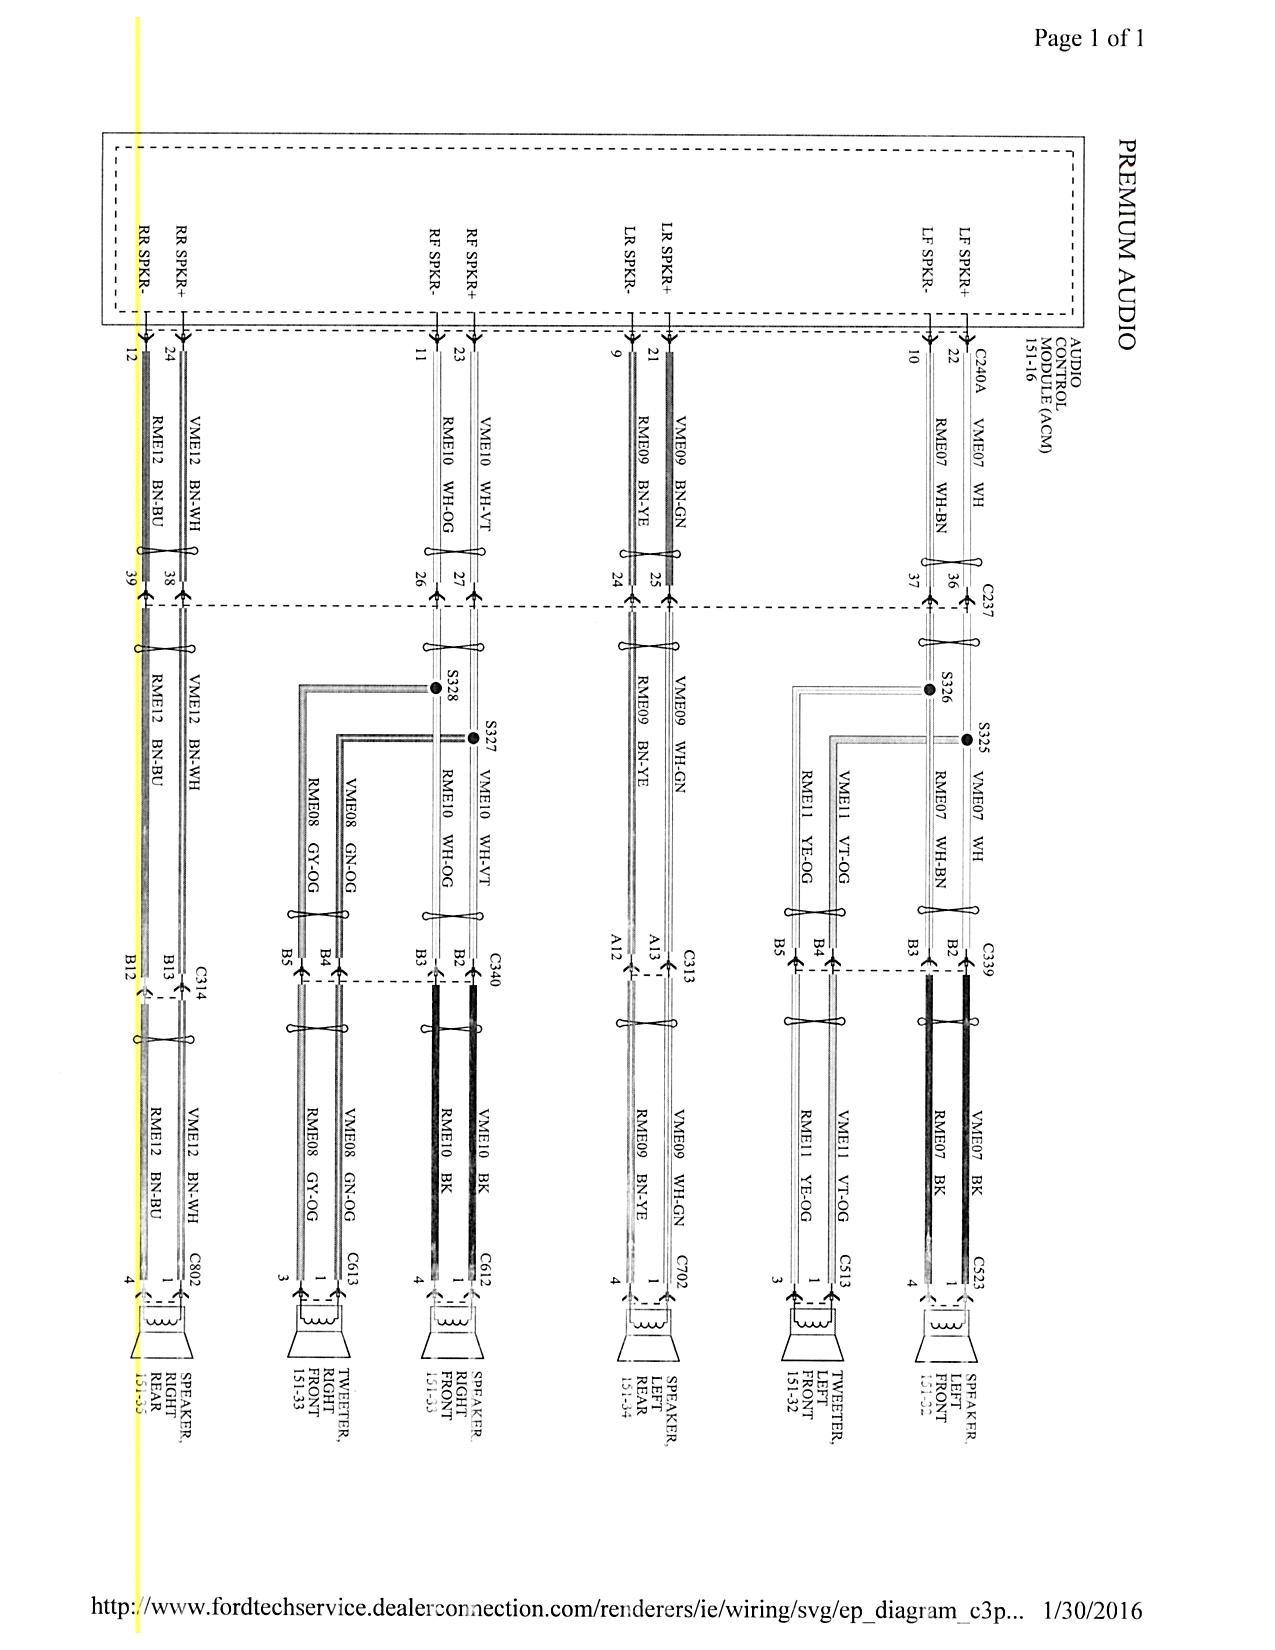 Focus Mk3 5 Stereo Wiring Diagram